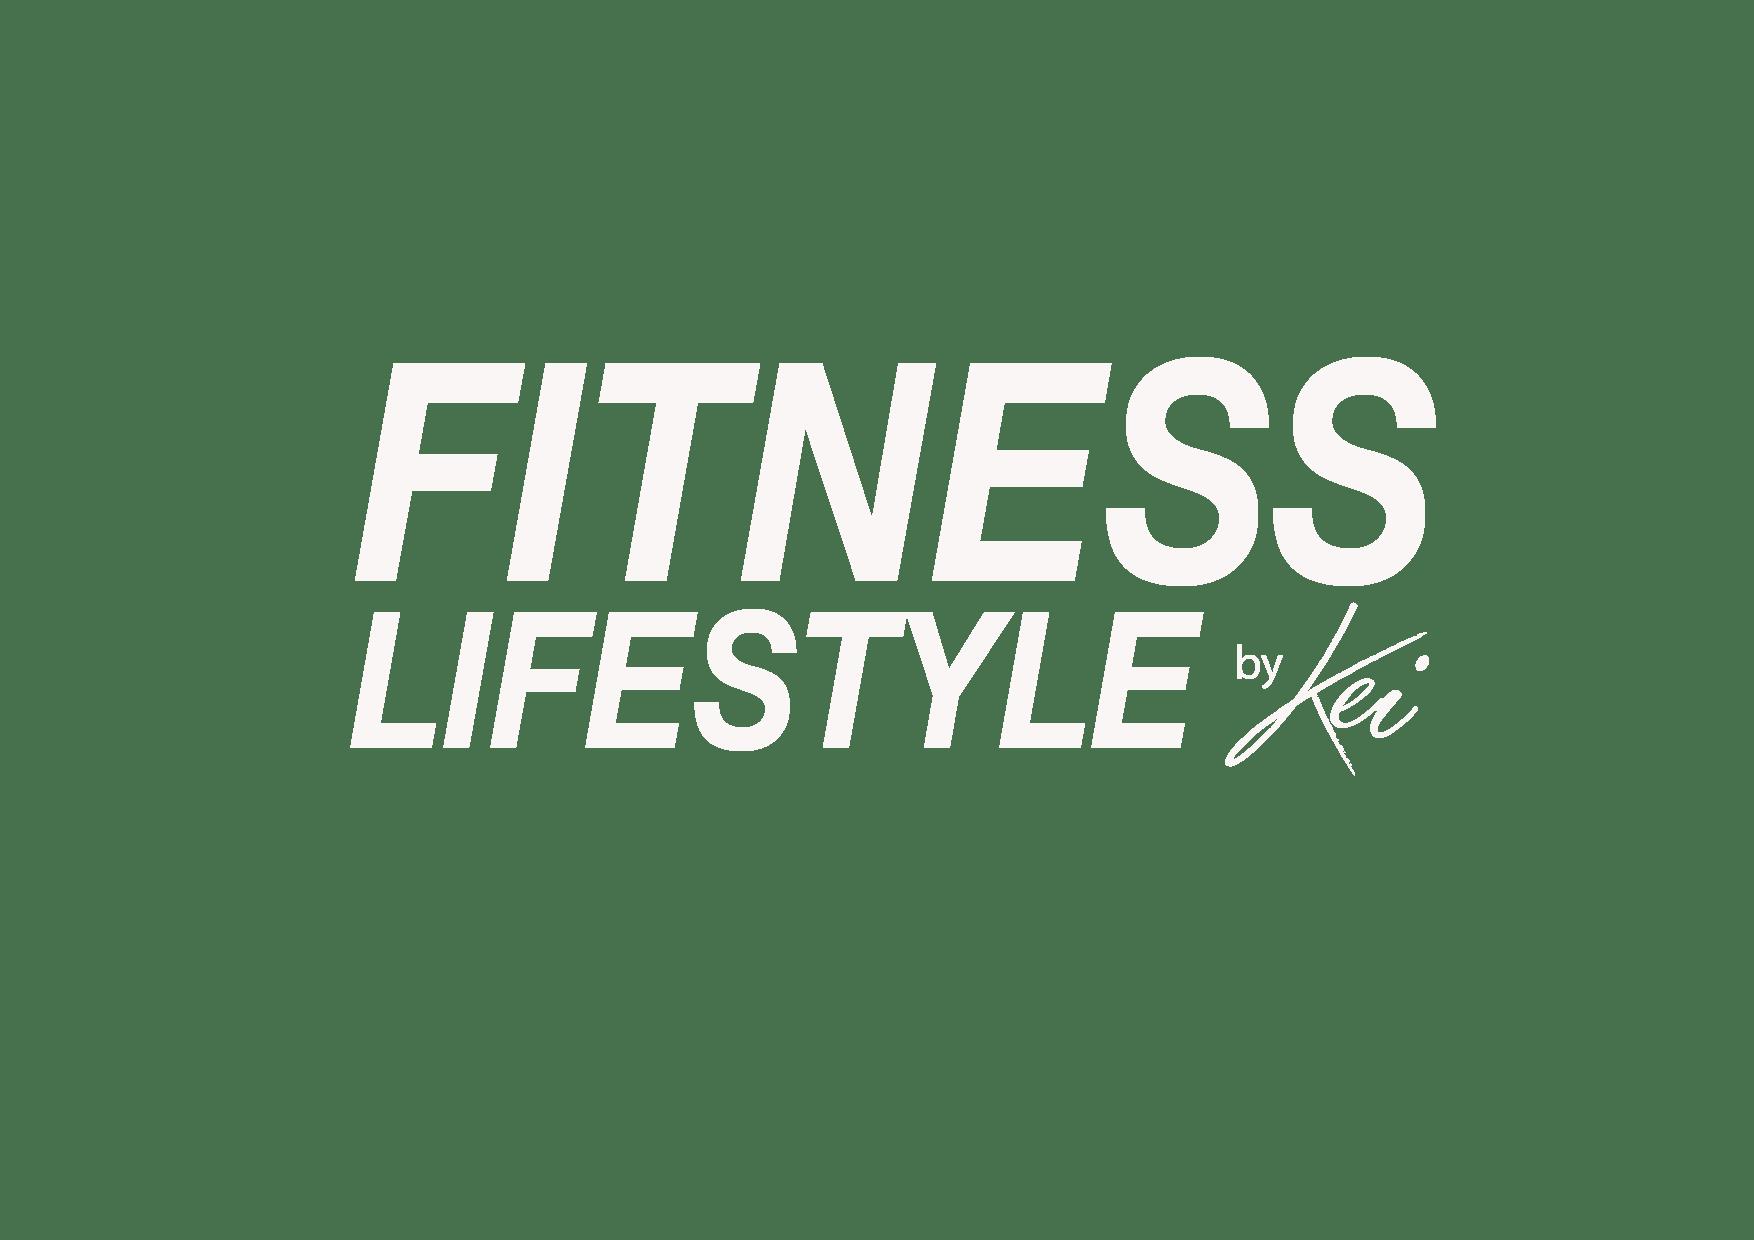 Logo Fitness Lifestyle Sin Fondo Blanco Fitness Lifestyle By Kei